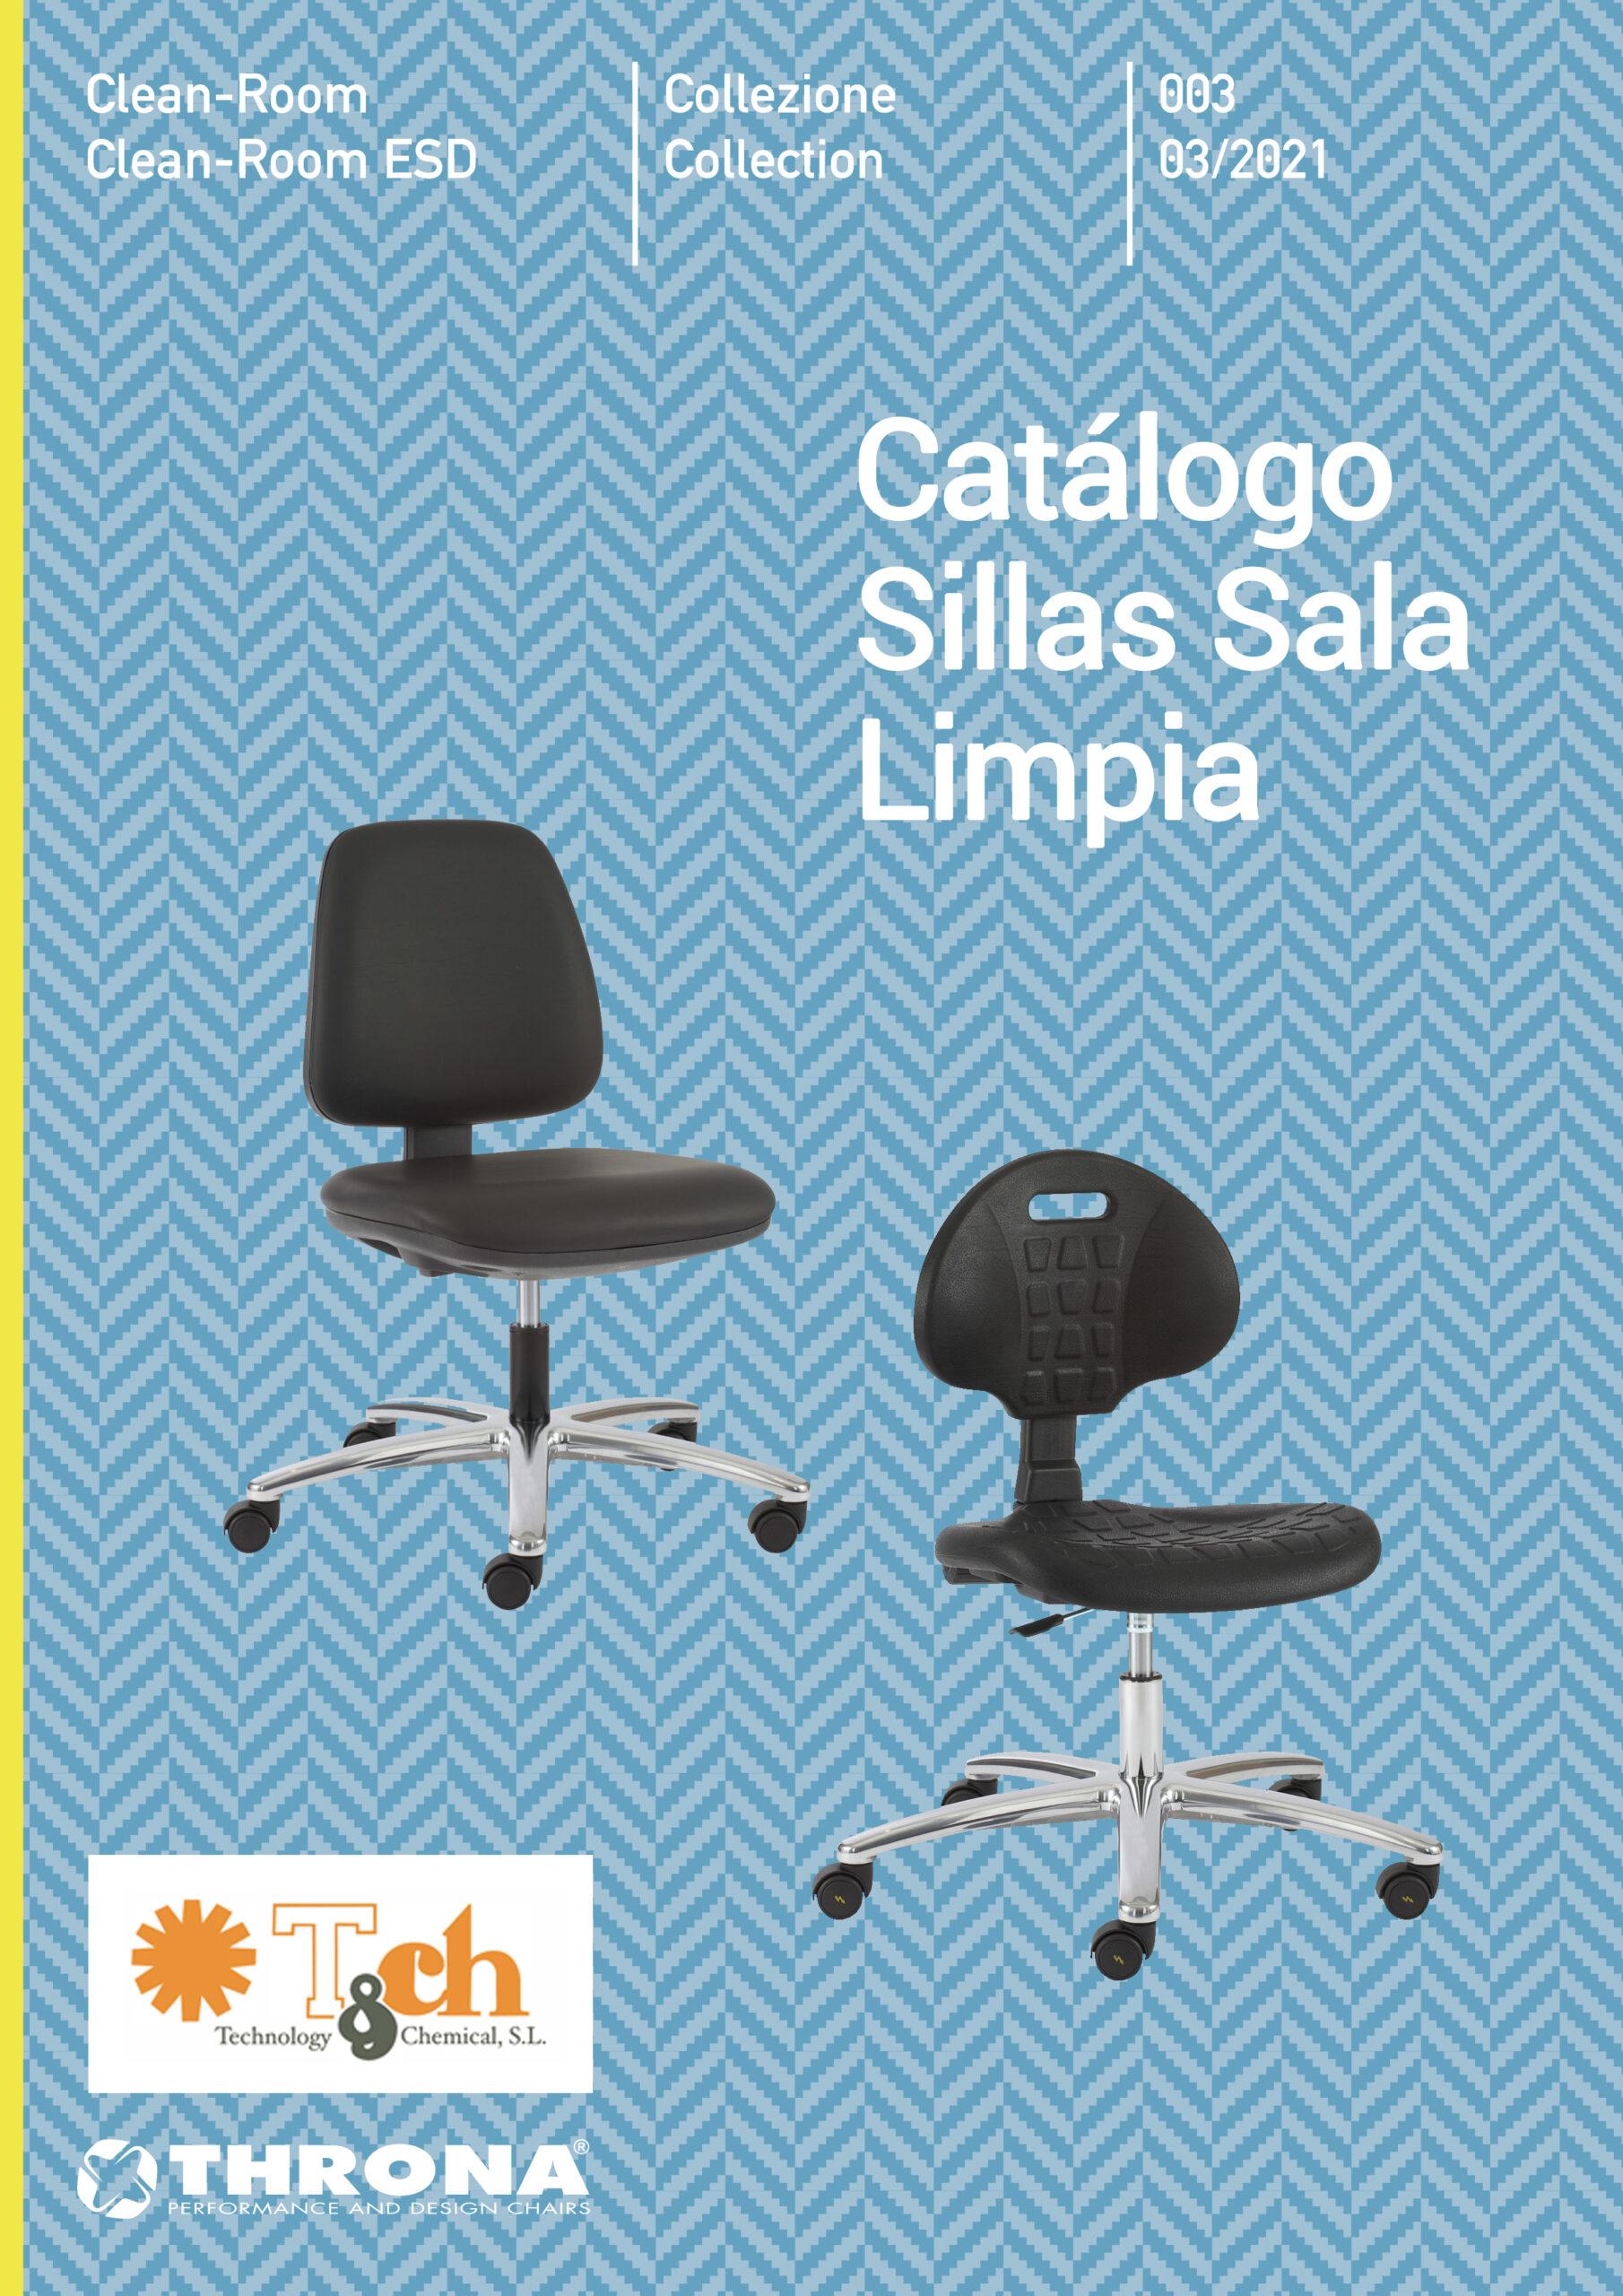 catálogo sillas sala limpia throna tch